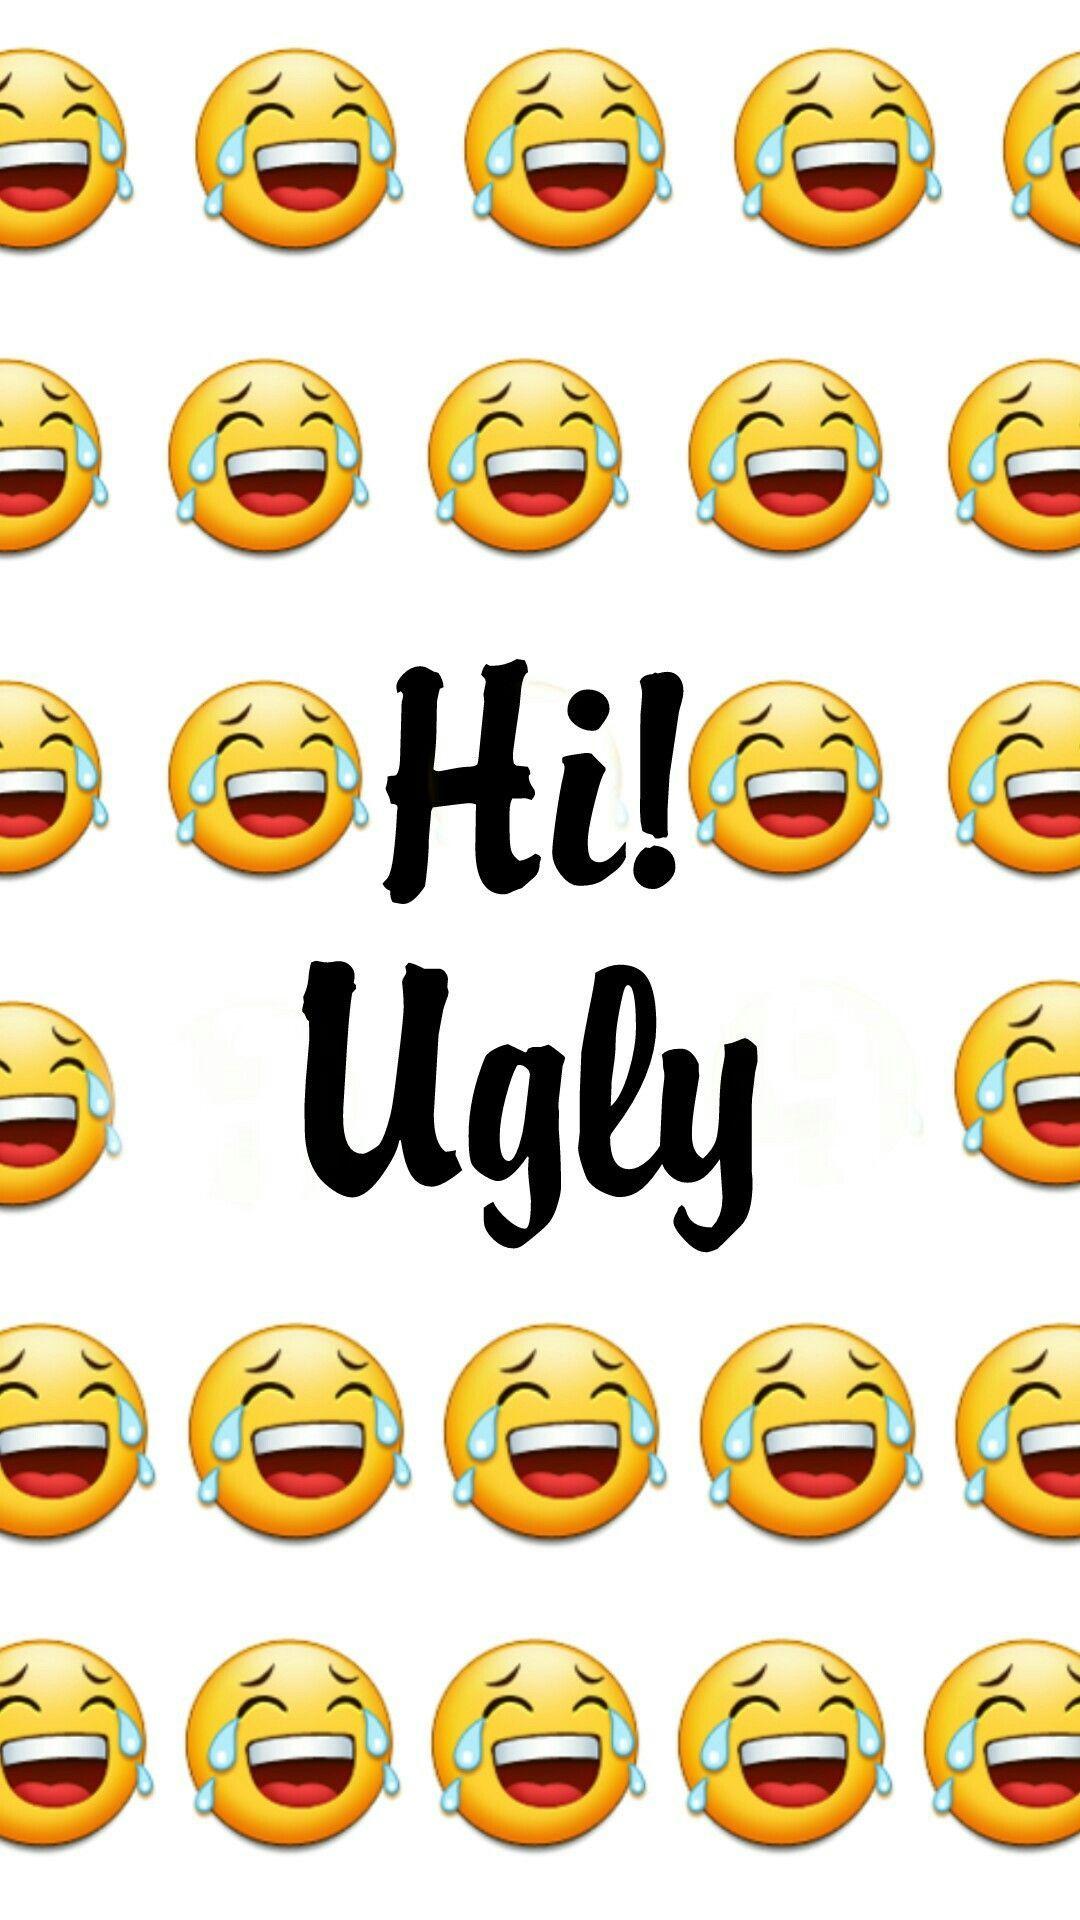 Laughing Emoticon Text : laughing, emoticon, Laugh, Emoji, Wallpapers, Wallpaper